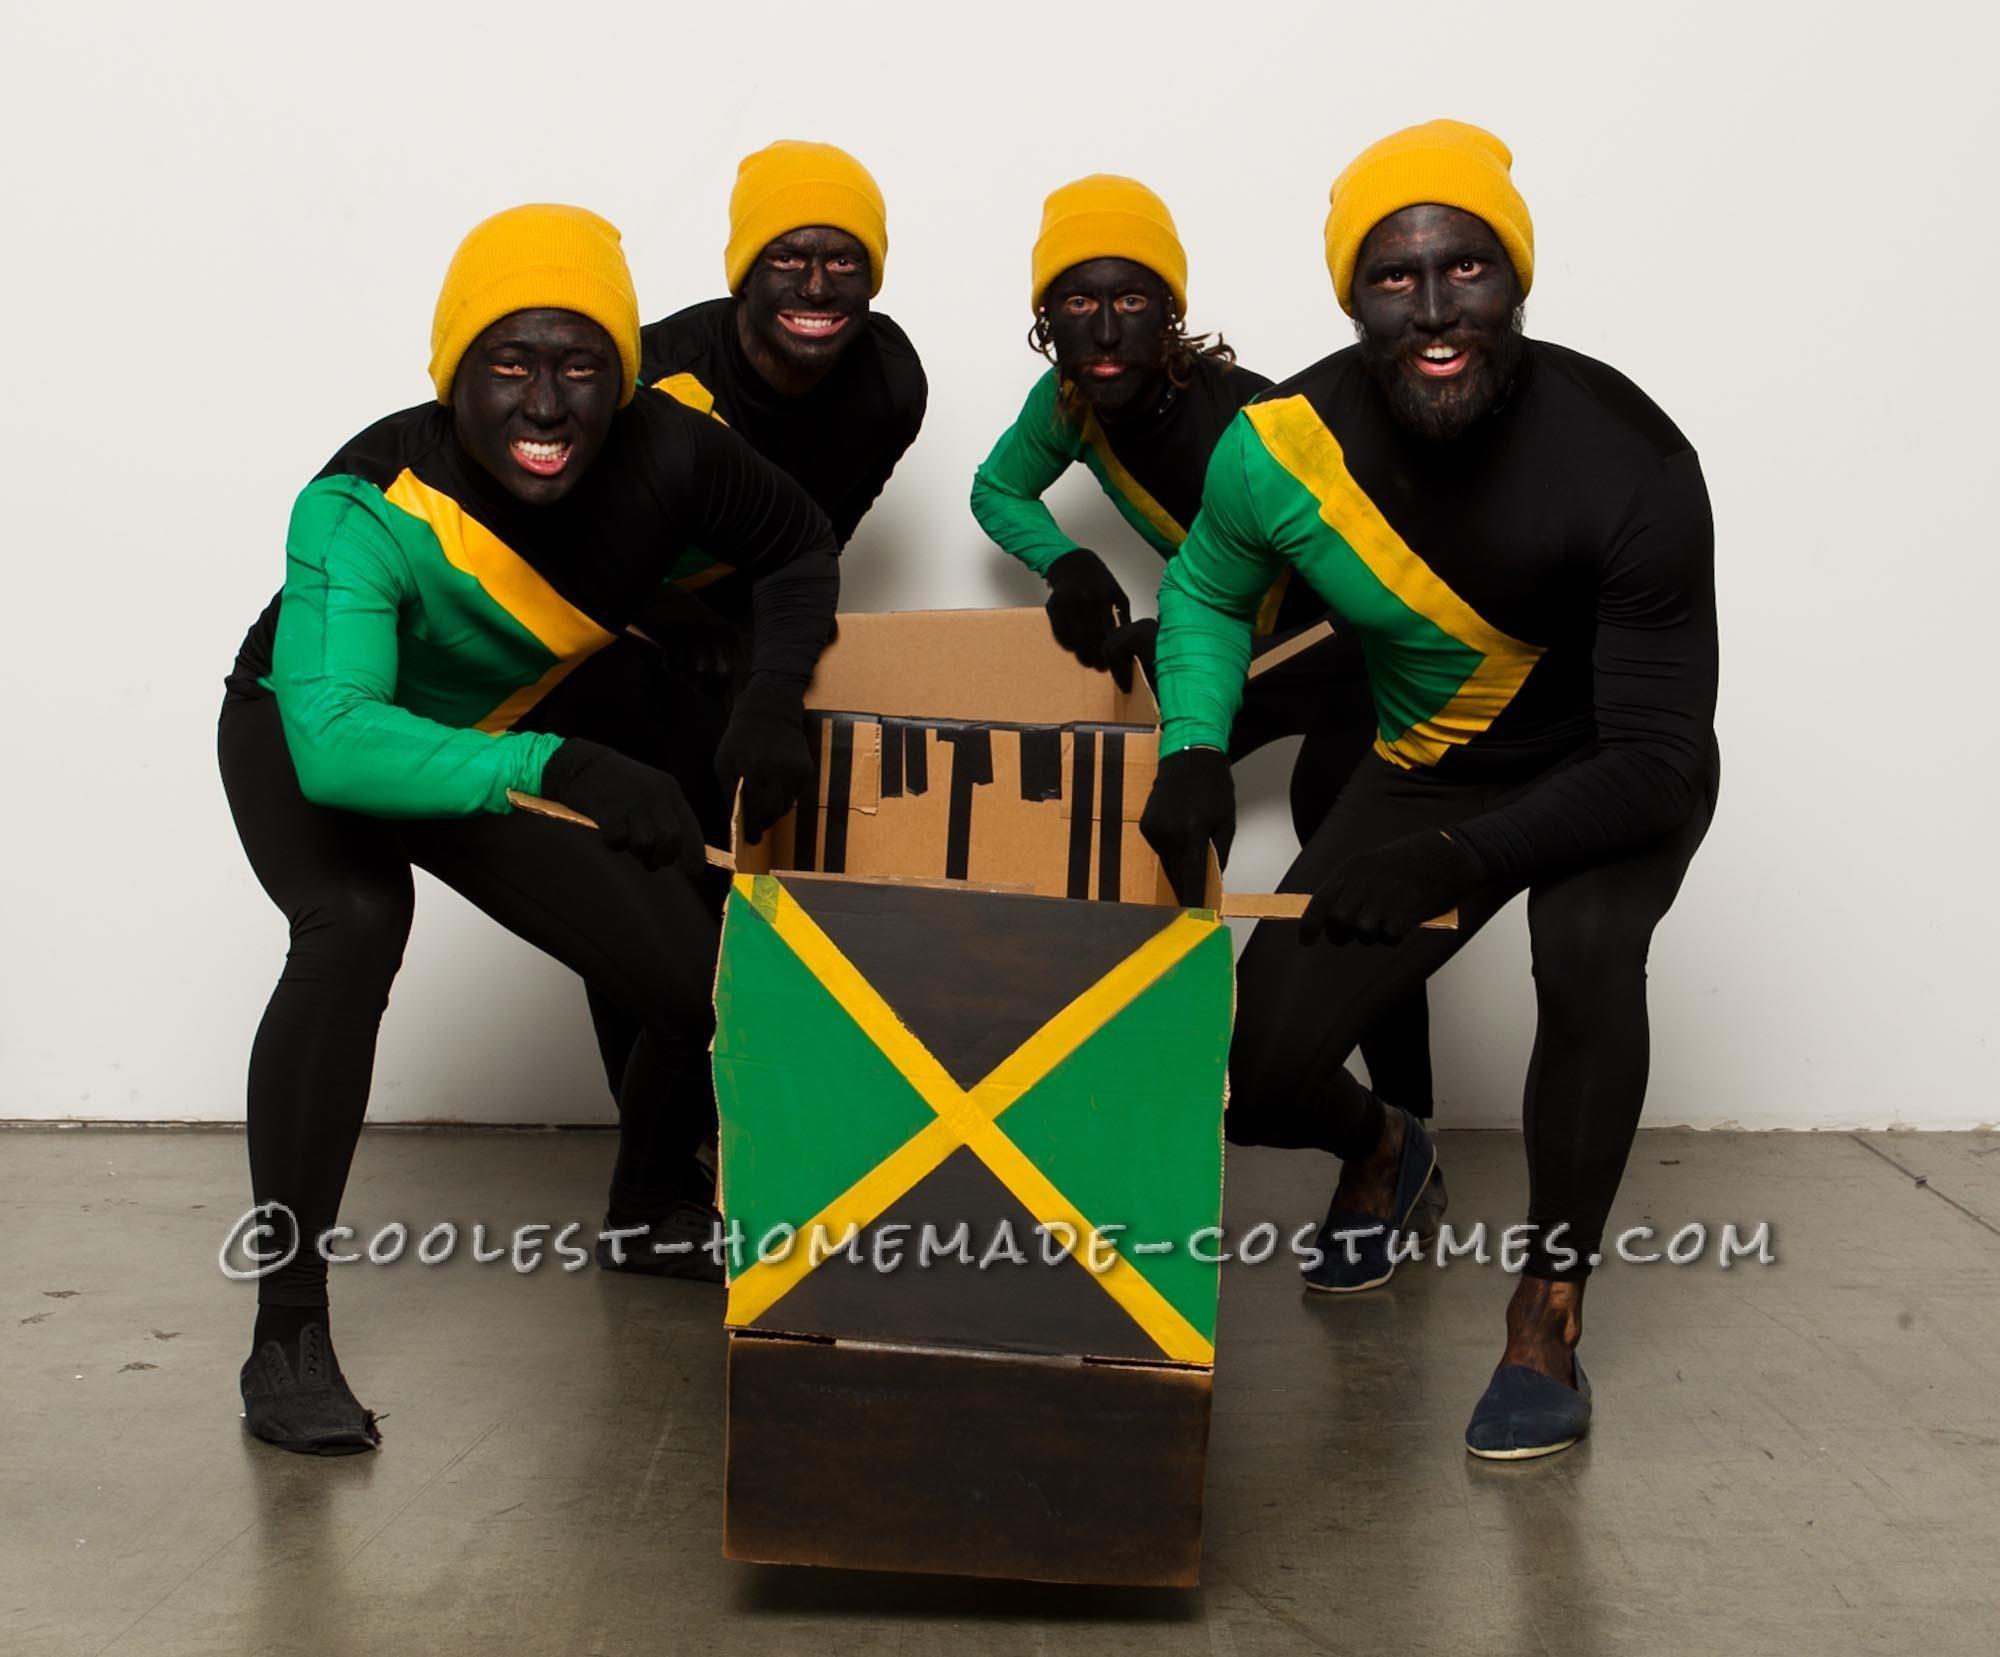 Cool Runnings Group Halloween Costume